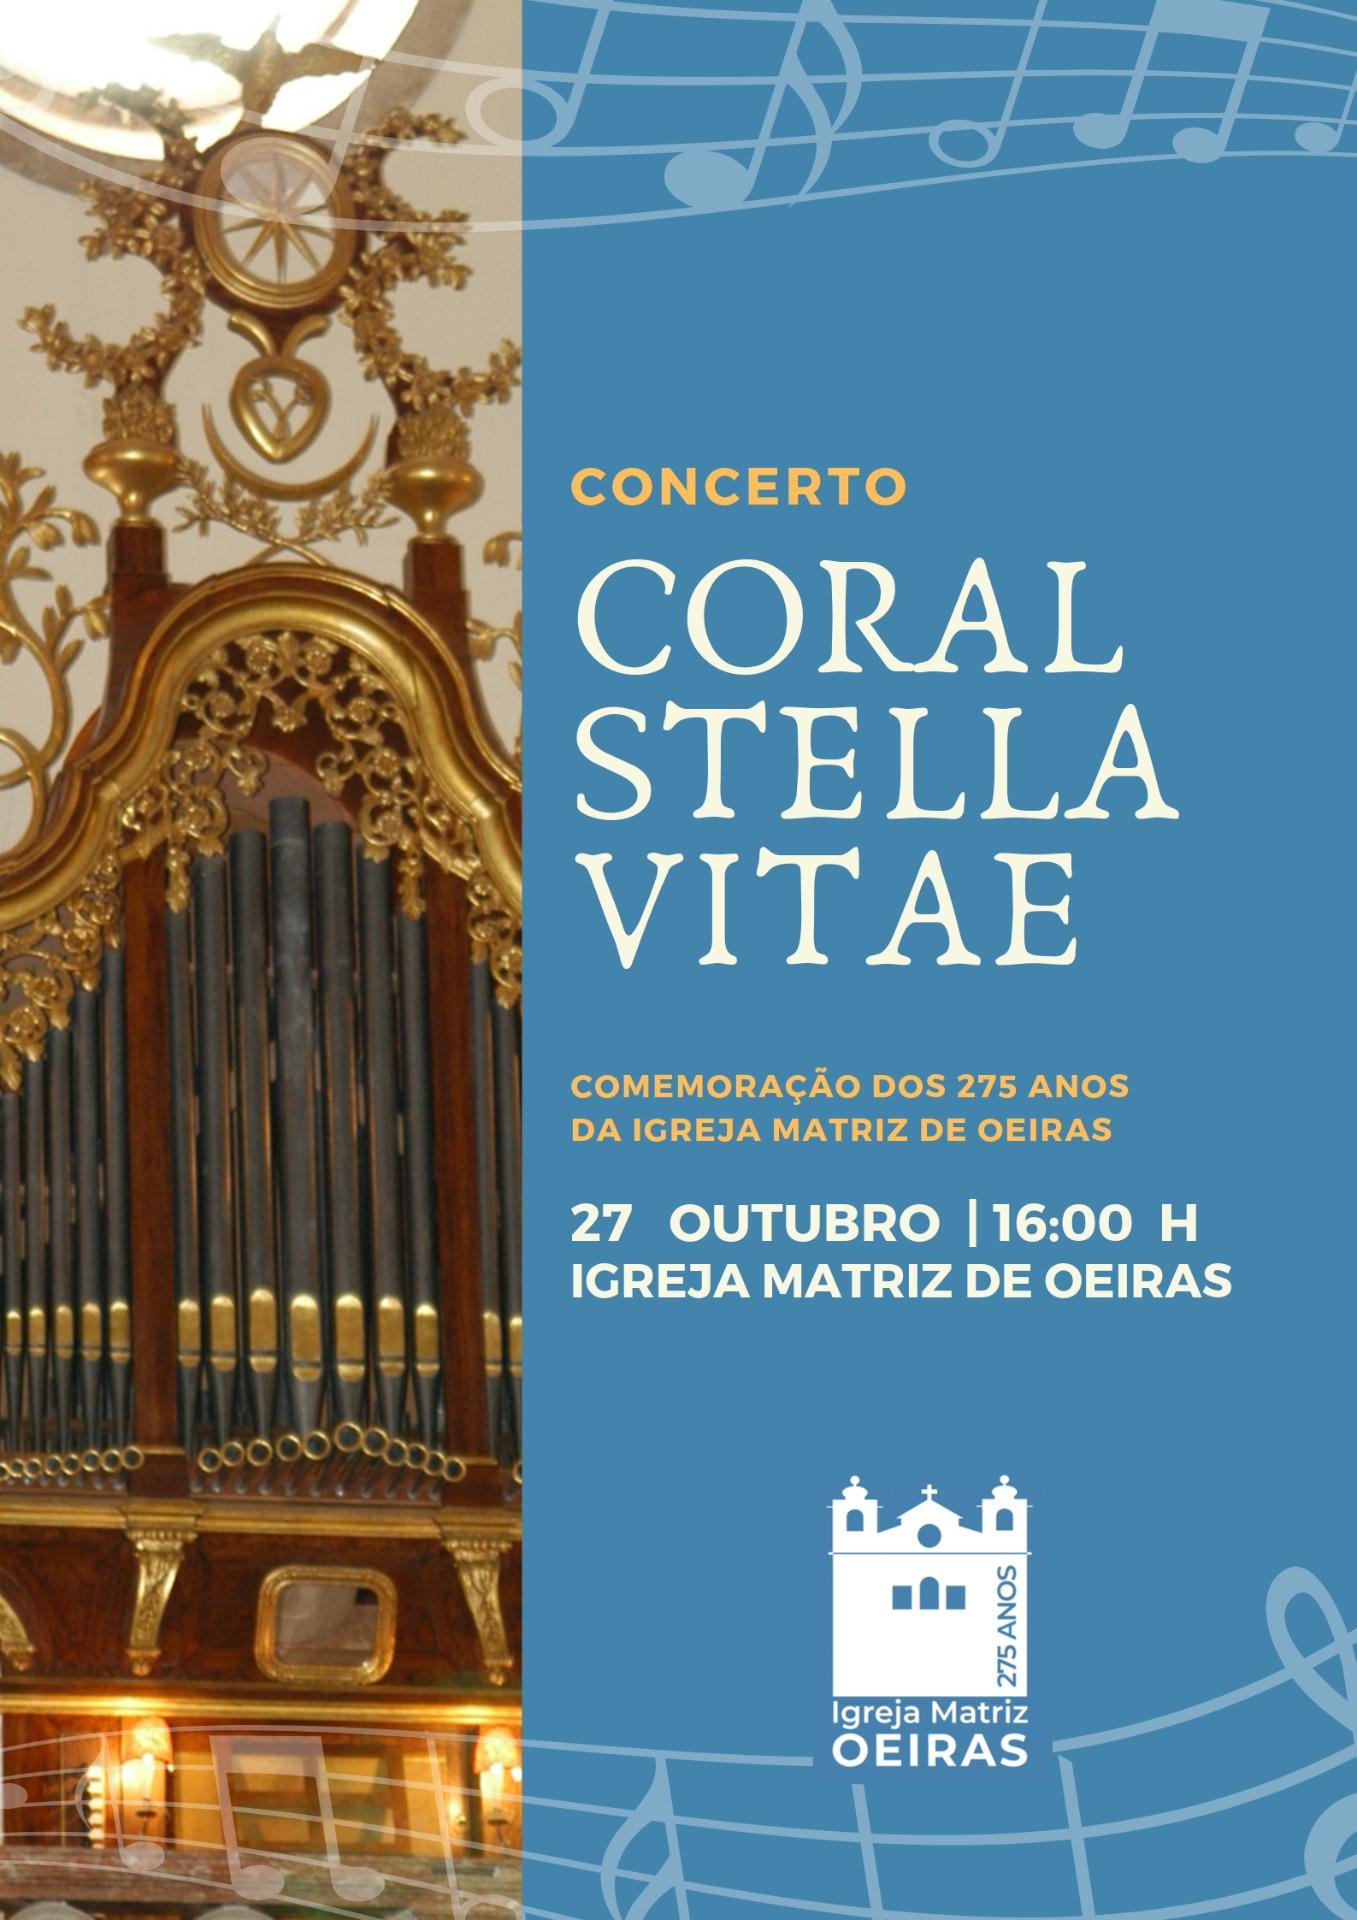 Coral Stella Vitae abriu a festa dos 275 anos da Igreja de Oeiras